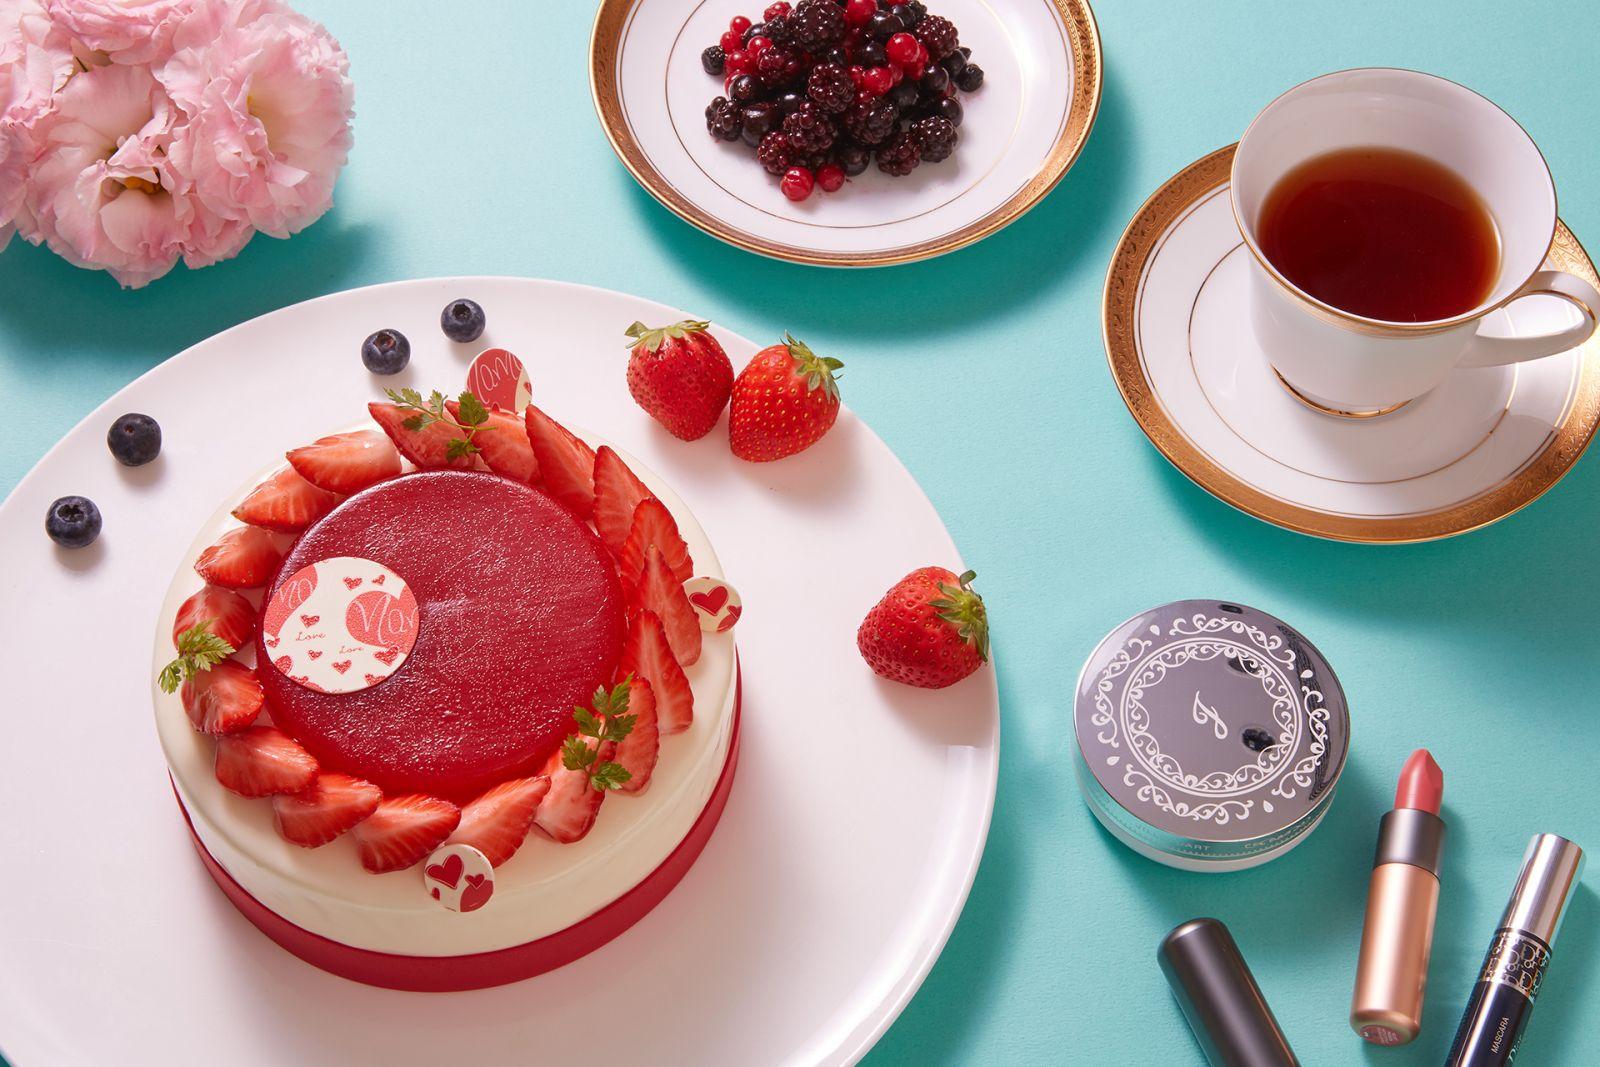 Corner Bakery63國賓麵包房 『莓滿甜心』母親節蛋糕